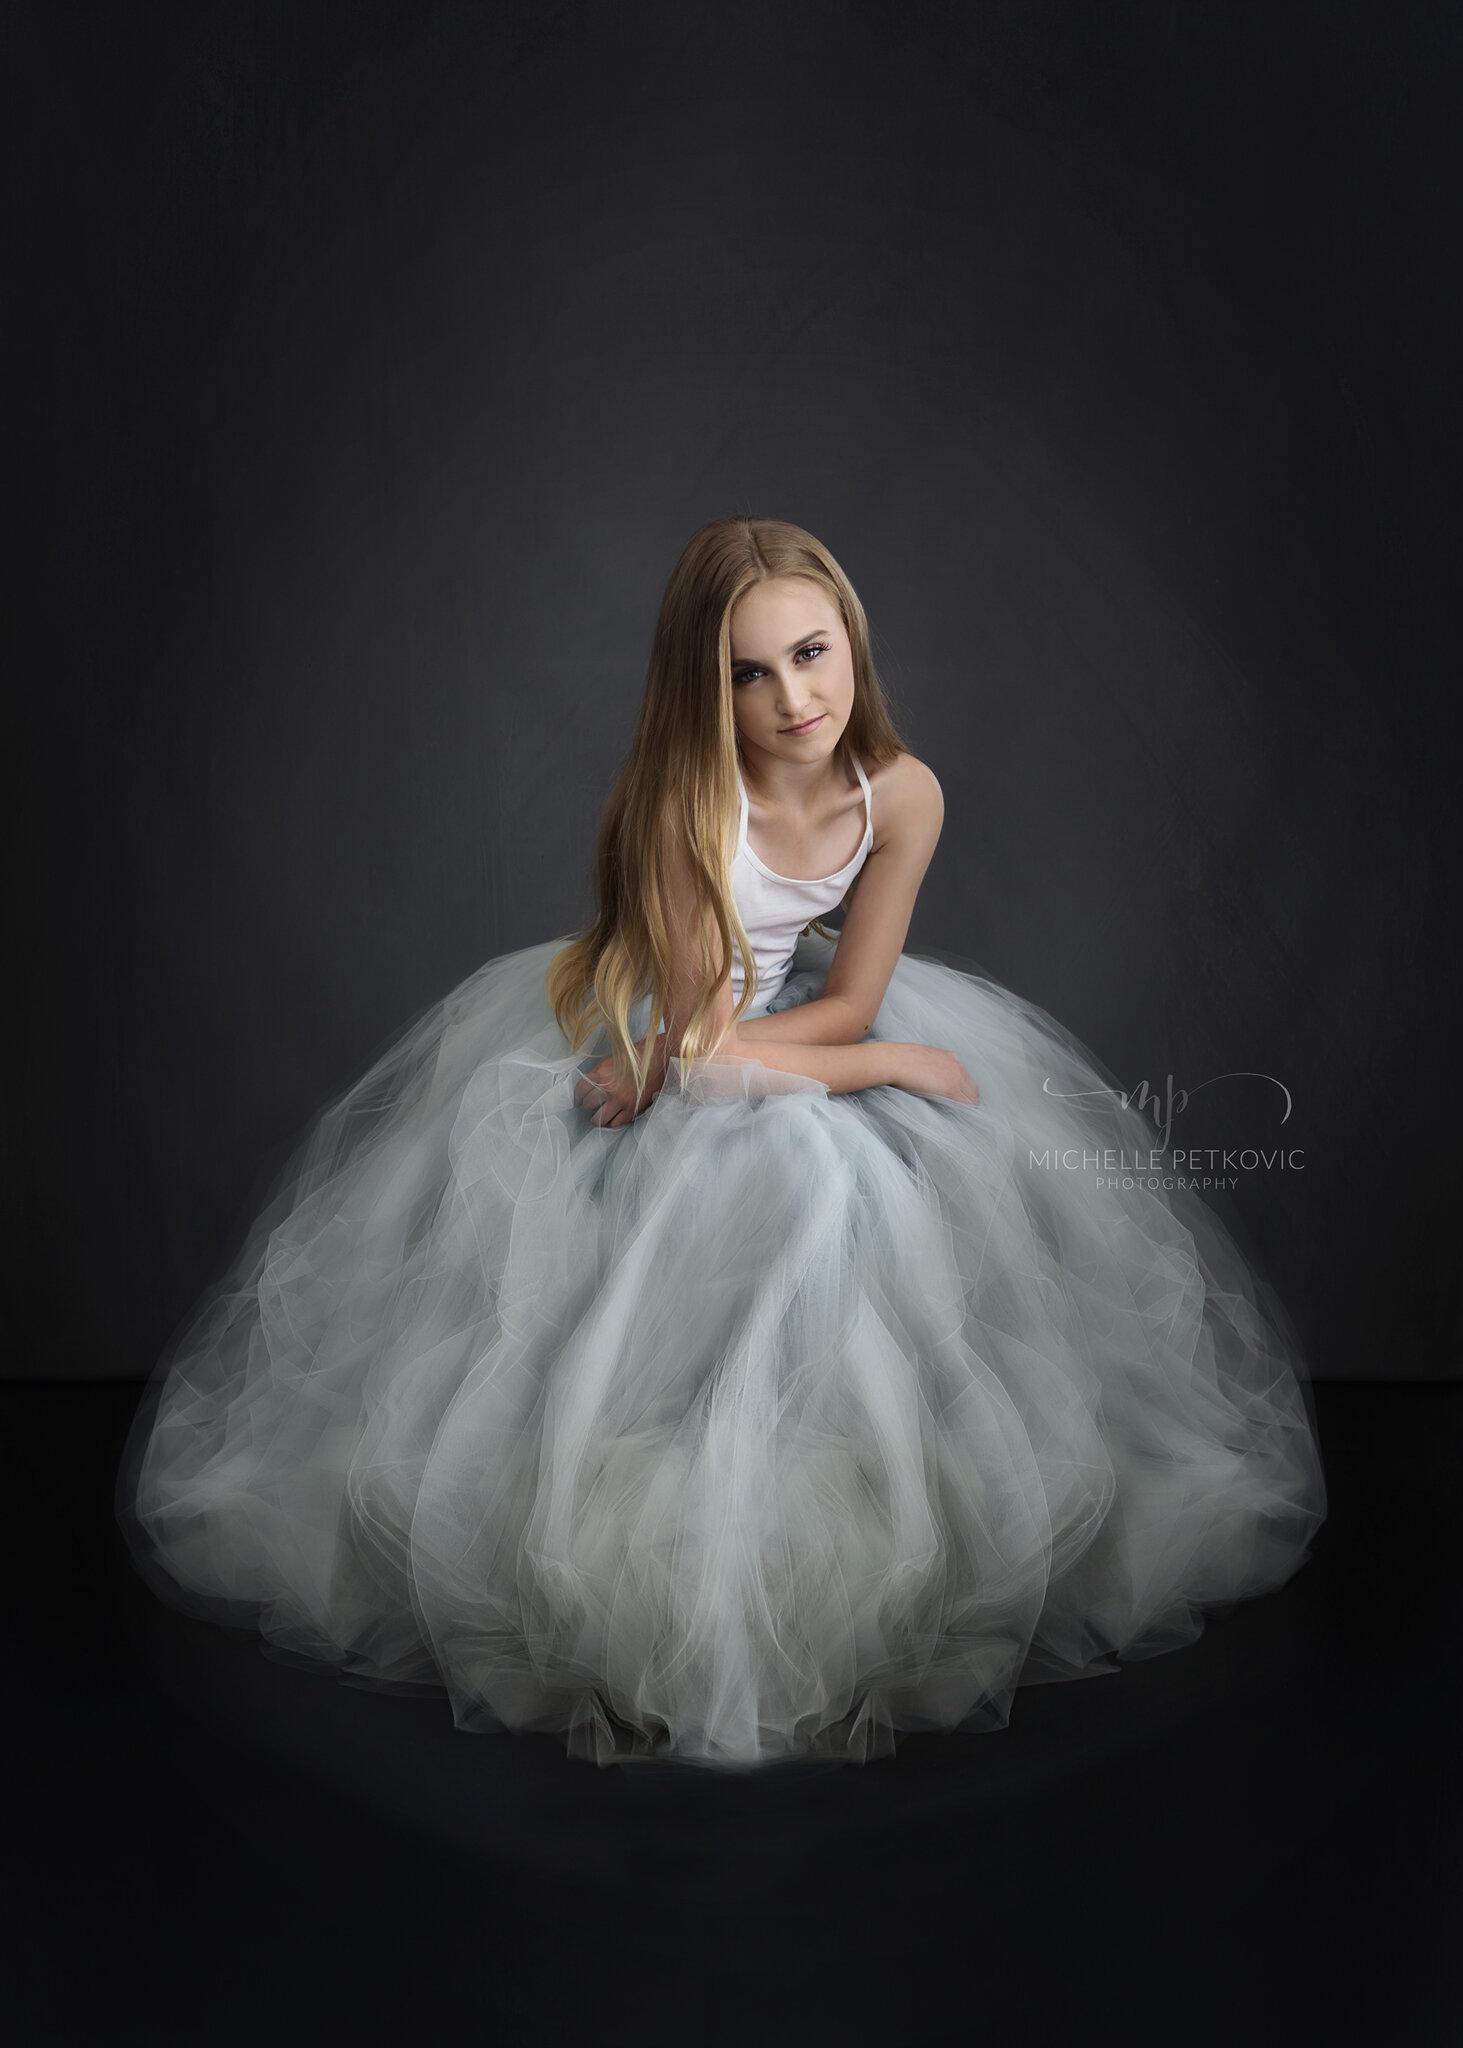 56906439_michelle_petkovic_photography_1.jpg